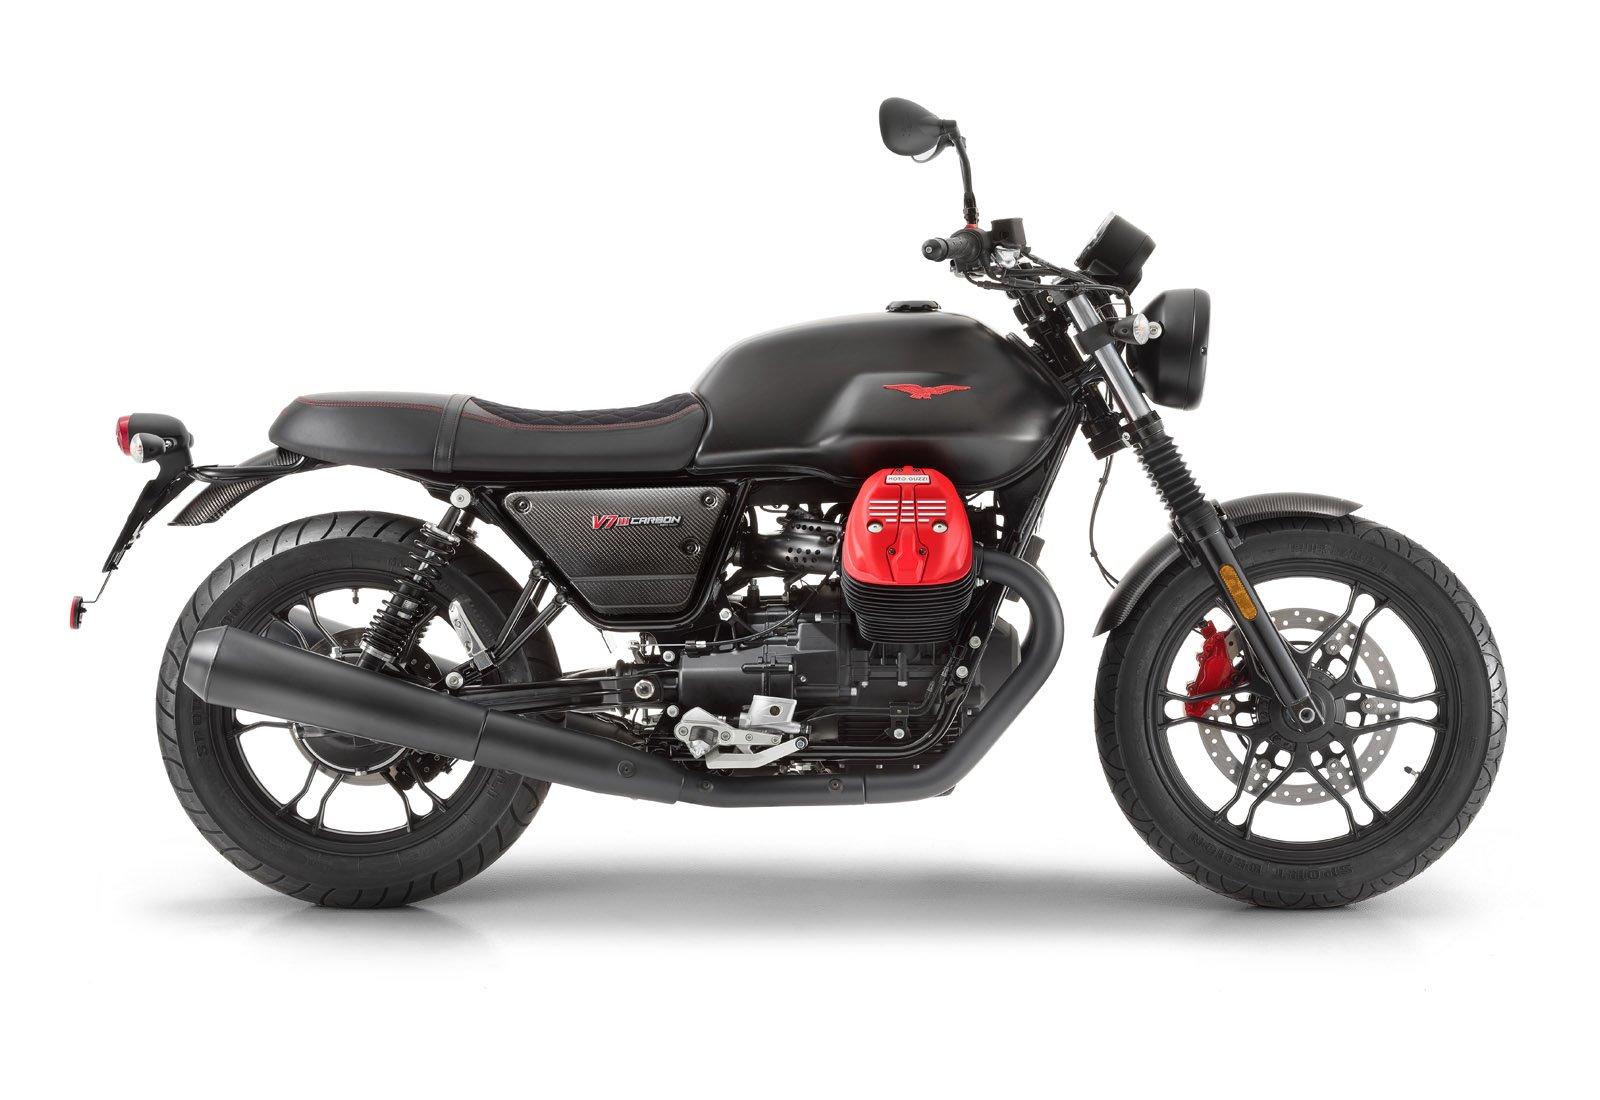 New-2018-Moto-Guzzi-V7III-Carbon-Dark